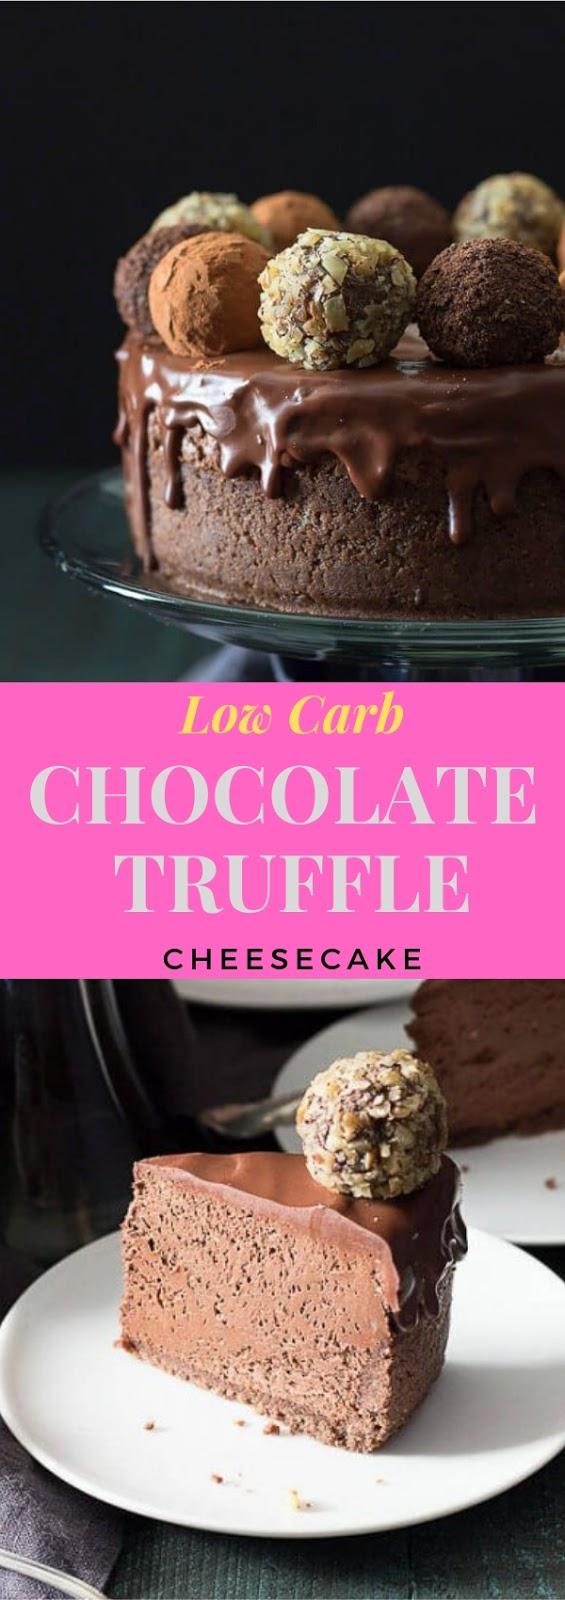 Low Carb Chocolate Truffle Cheesecake #dessert #lowcarb #chocolate #truffle #cheesecake